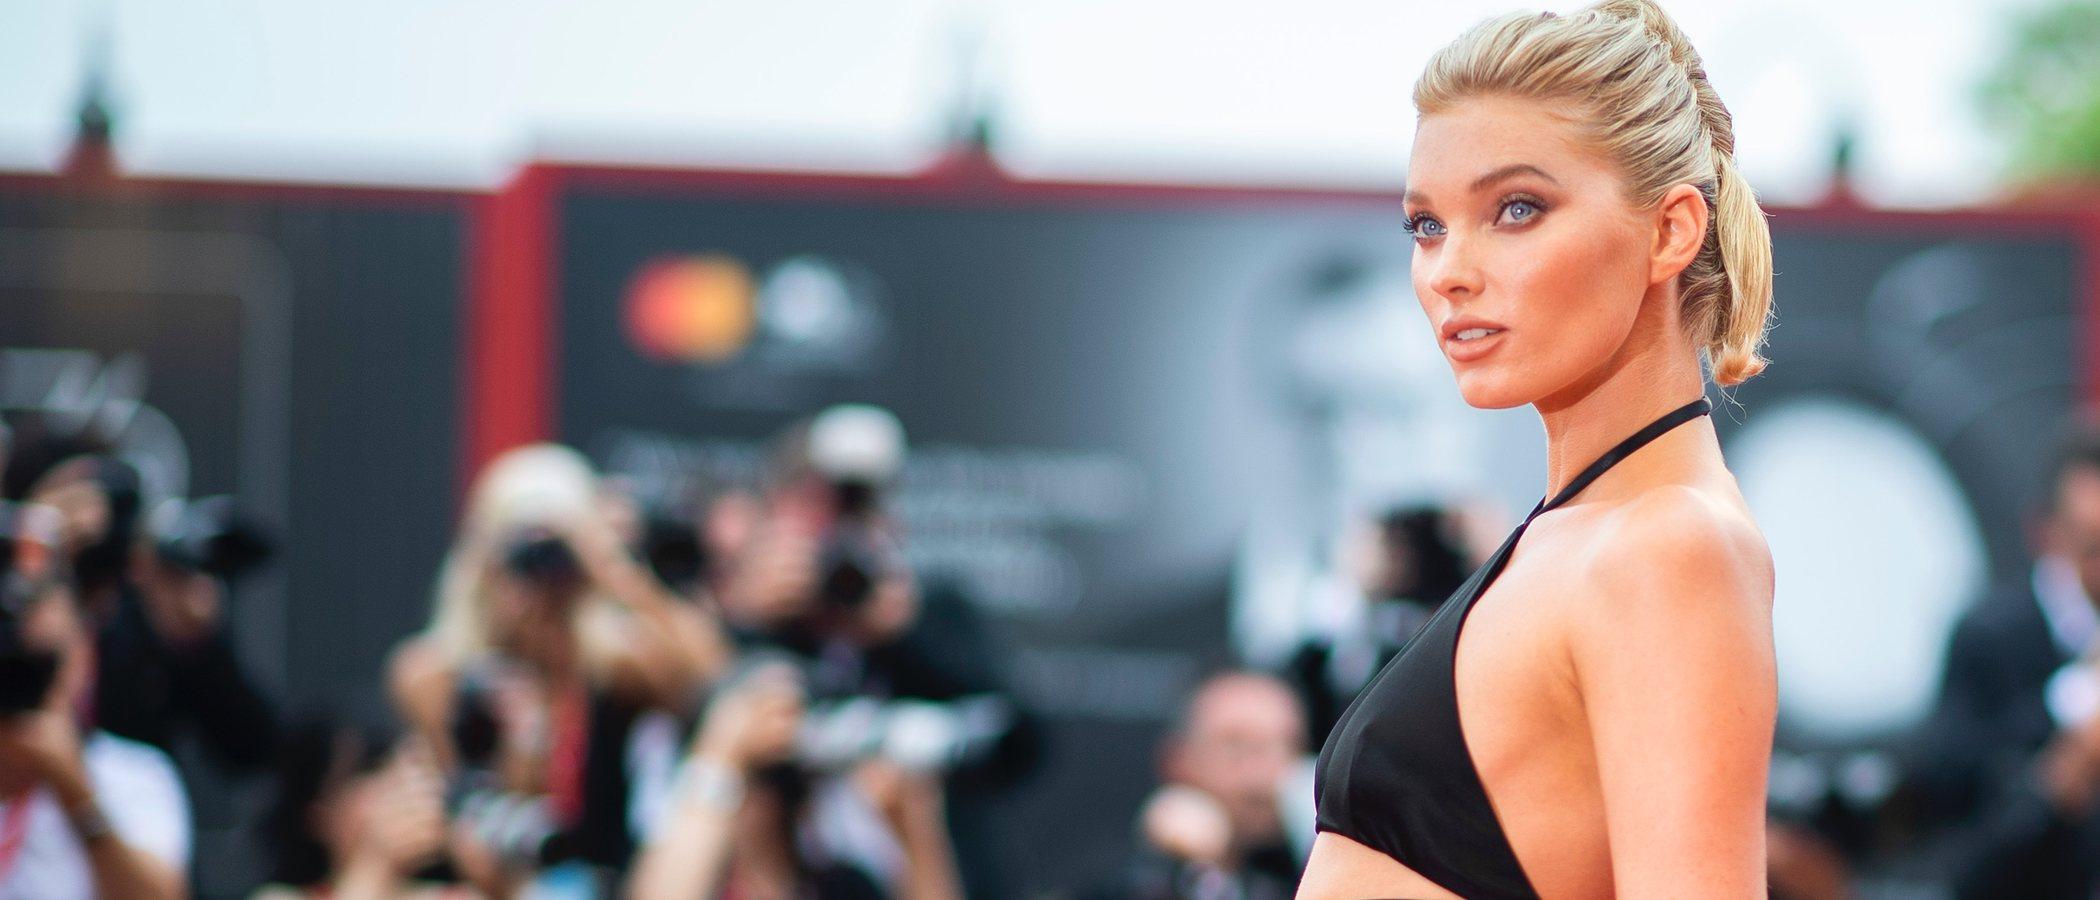 Elsa Hosk, Candice Swanepoel... Las modelos acaparan la primera alfombra roja del Festival de Venecia 2019